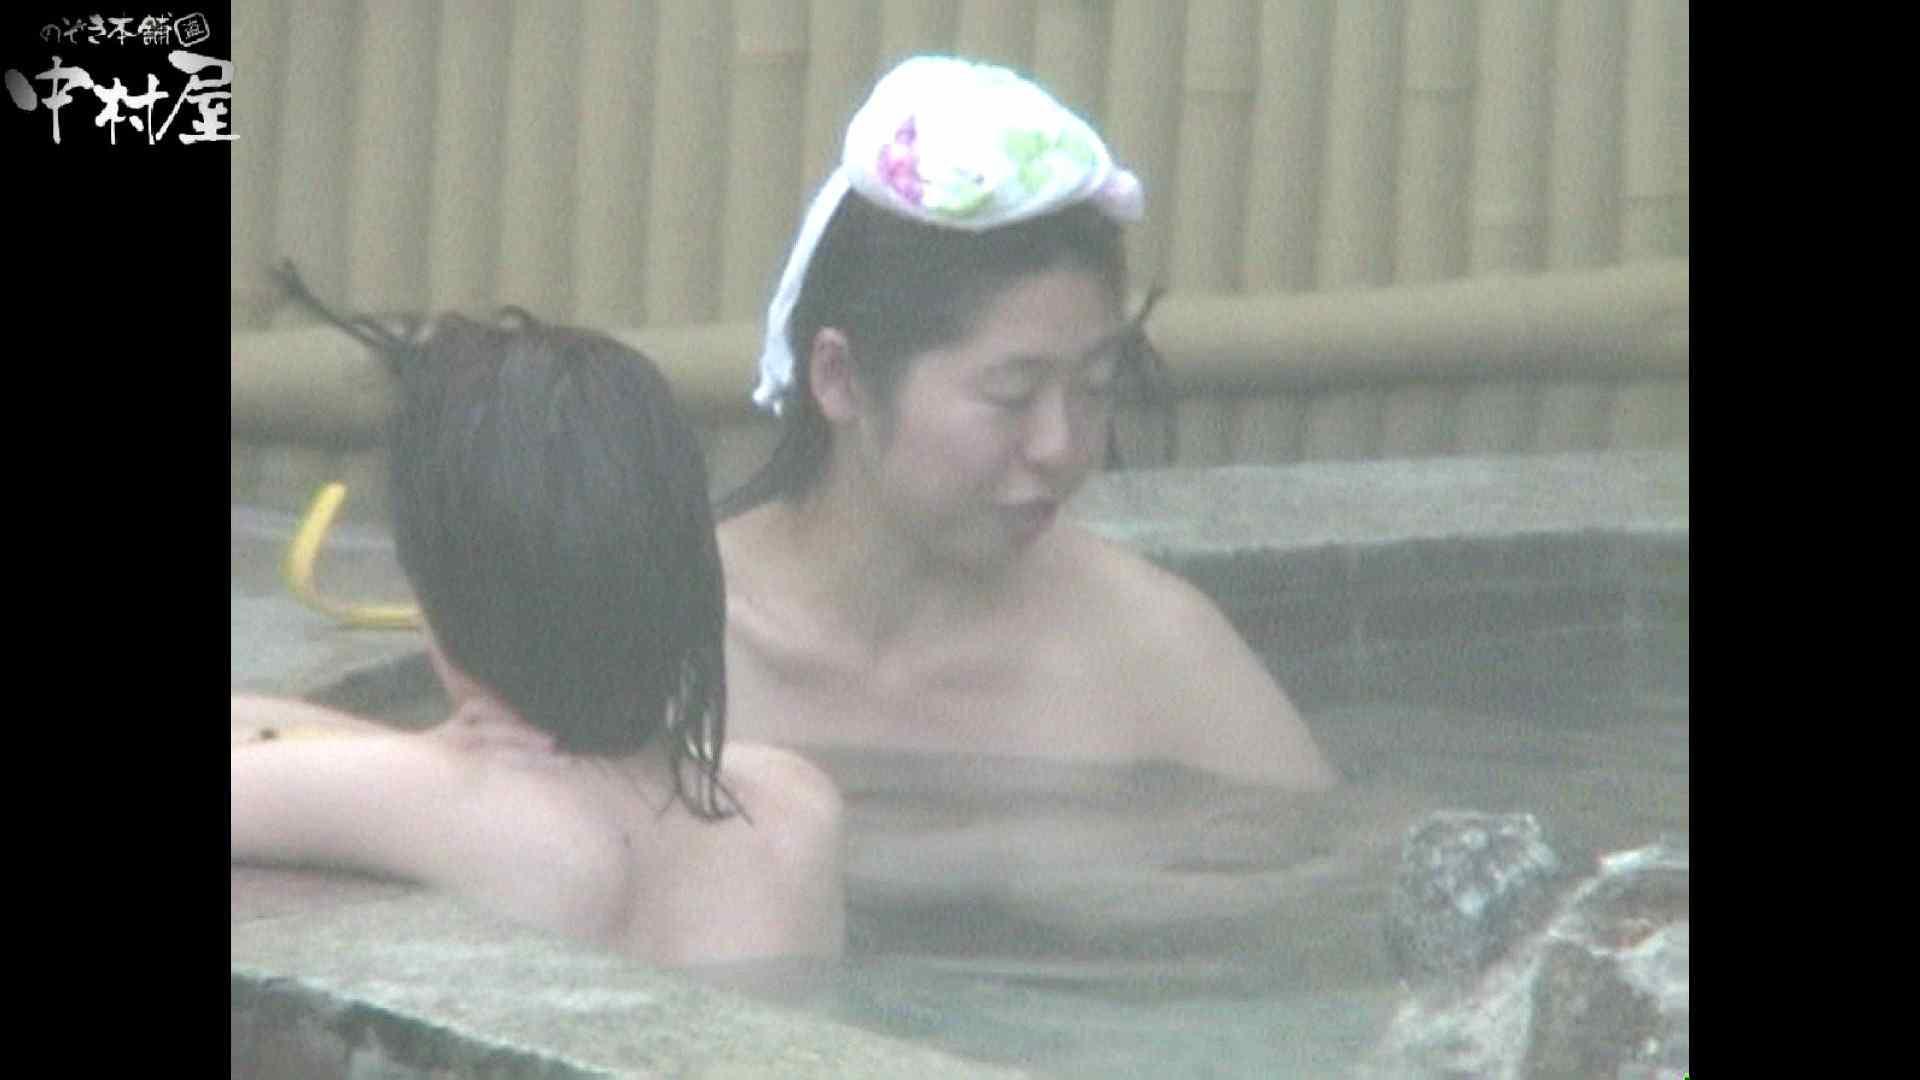 Aquaな露天風呂Vol.932 盗撮師作品 | 露天風呂突入  106pic 58